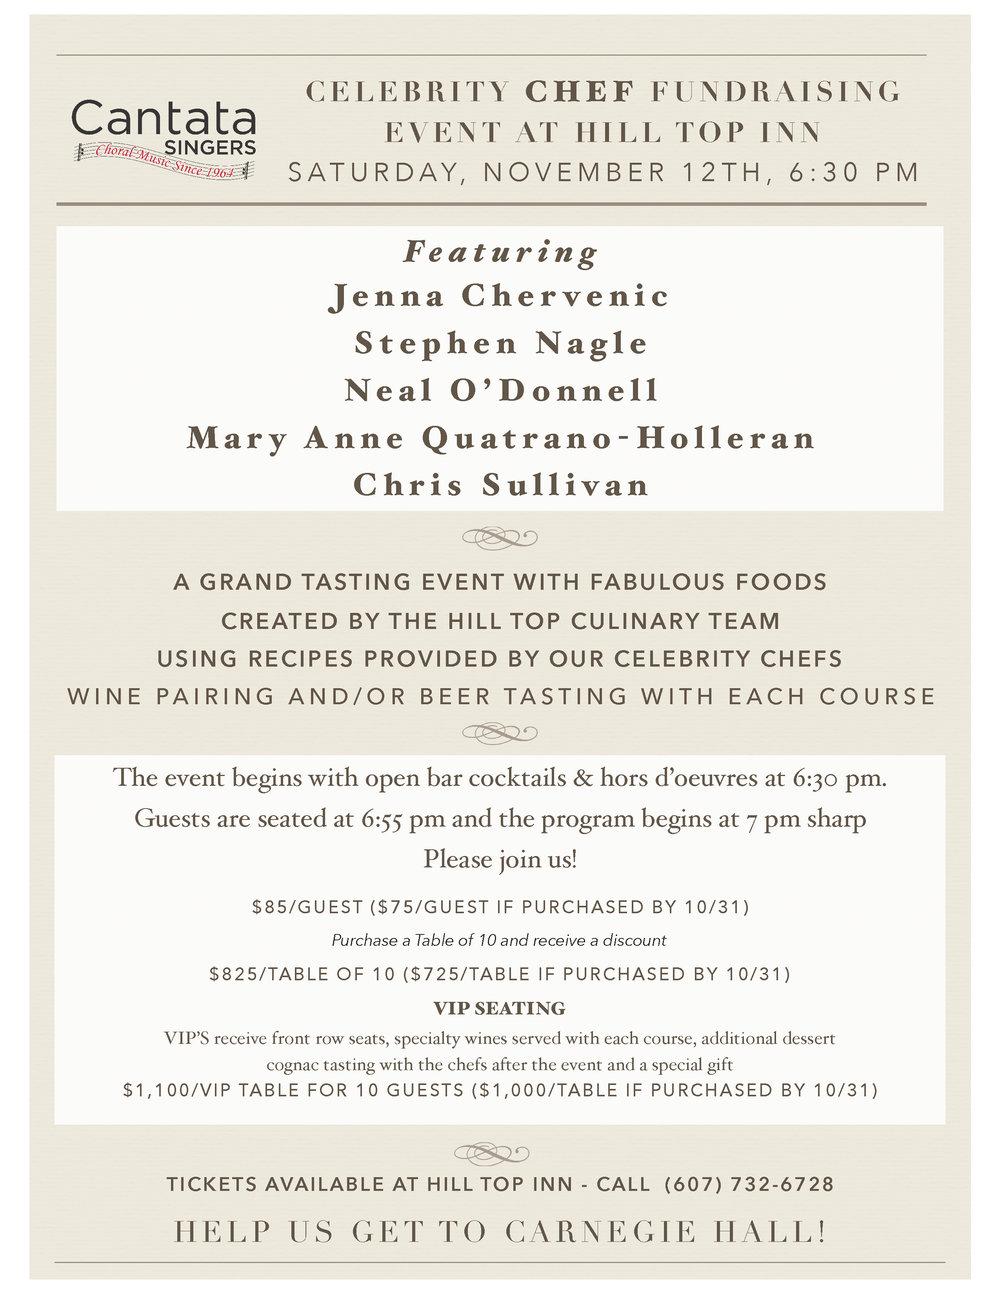 Cantata Carnegie Celebrity Chef Poster copy.jpg